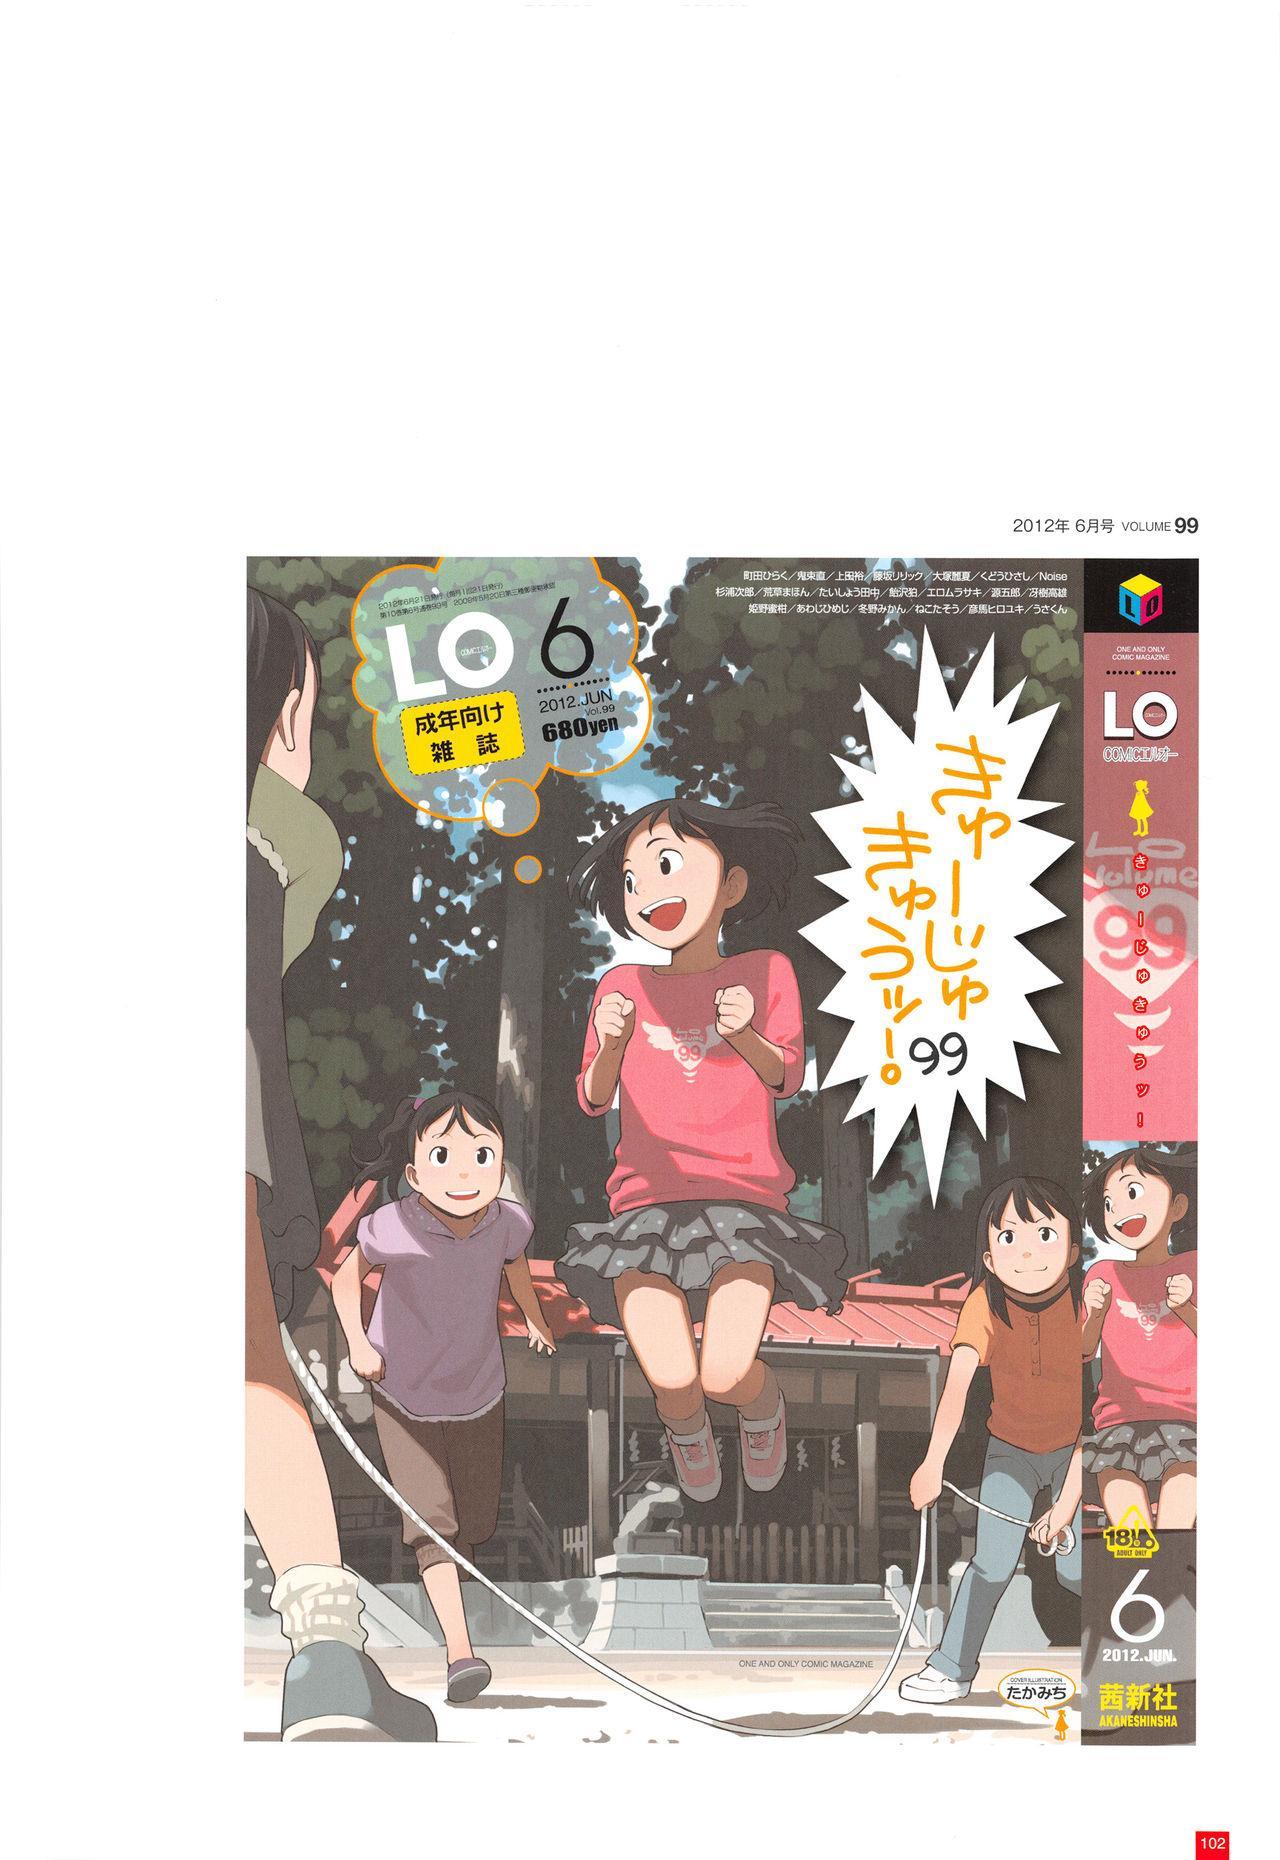 LO Artbook 2-A TAKAMICHI LOOP WORKS 104